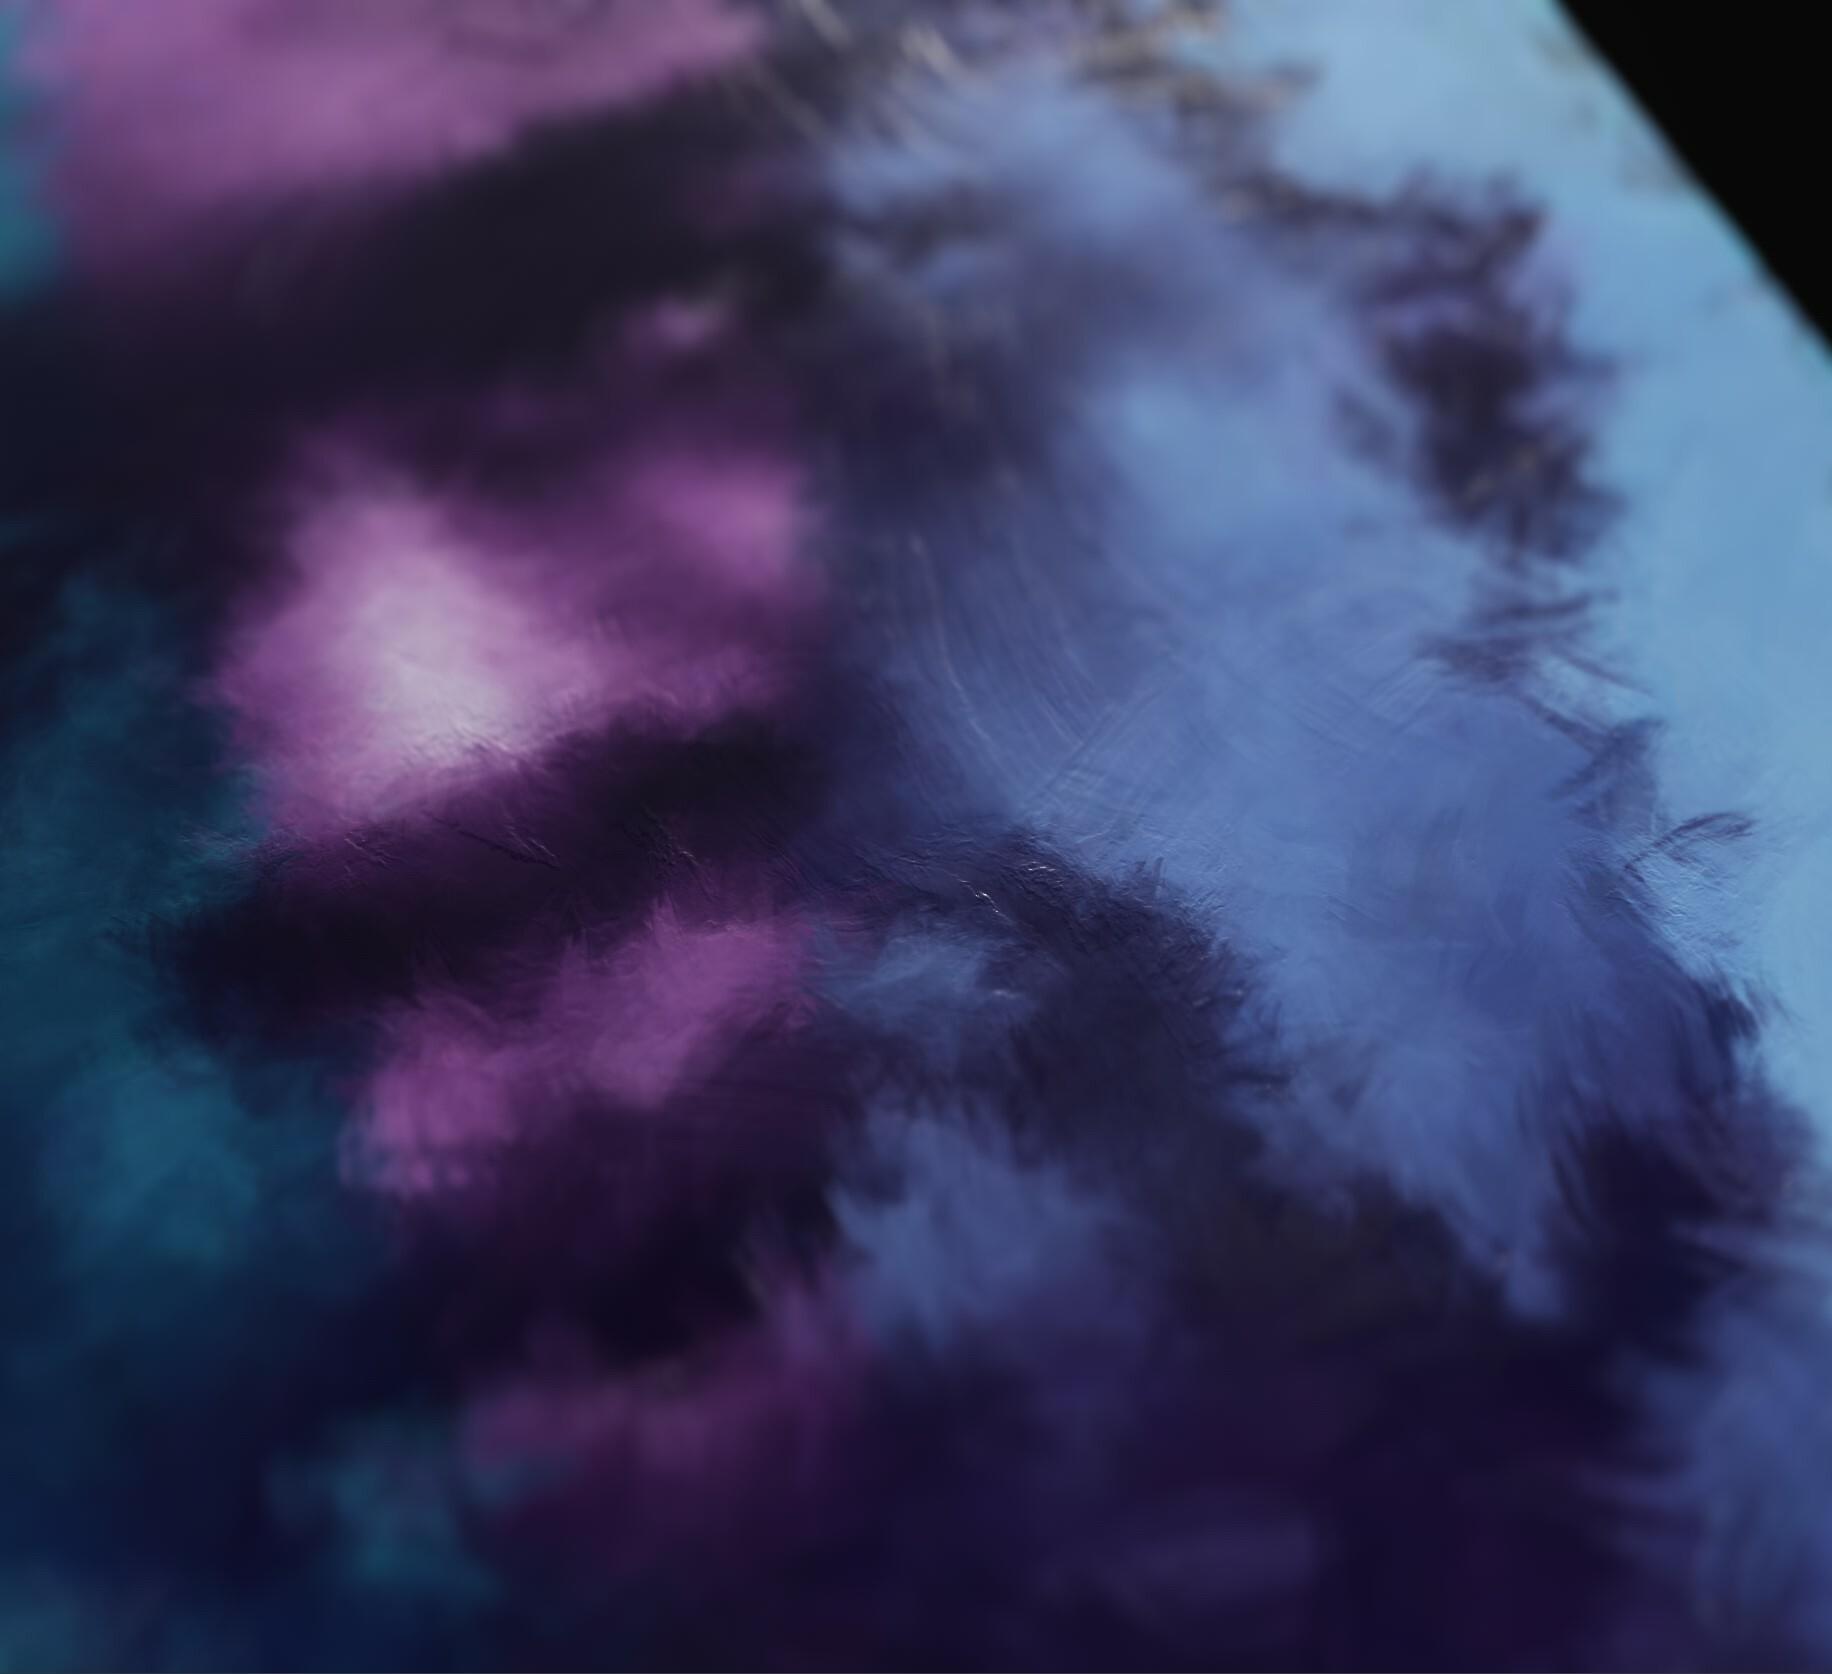 CloseUp on that paint (3D view)